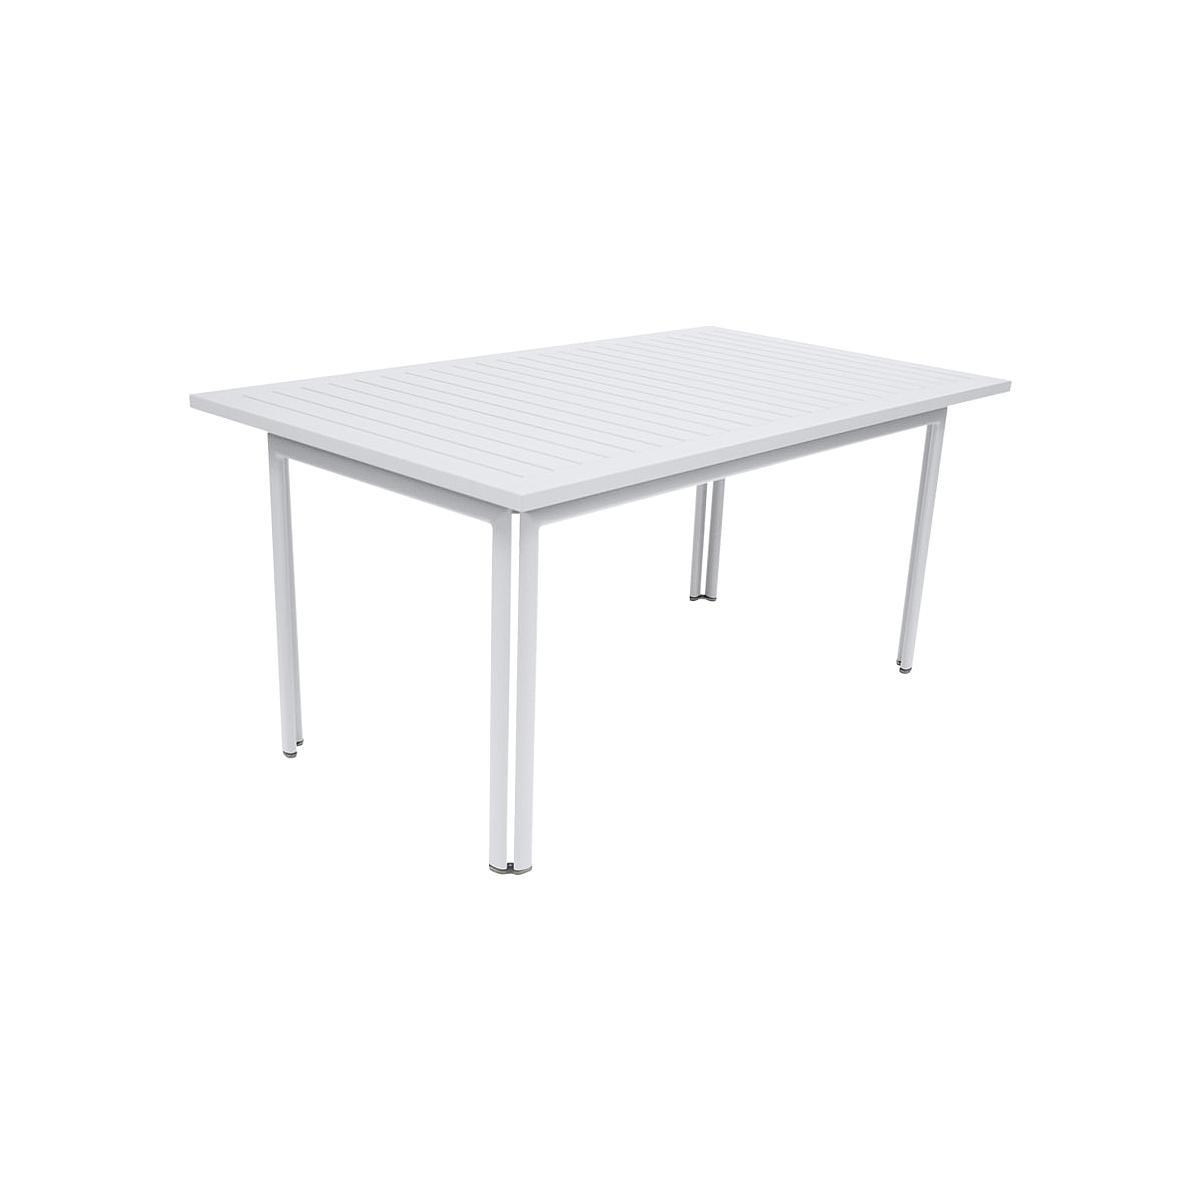 Table de jardin COSTA FERMOB 160x80cm Blanc coton | abitare-living.lu